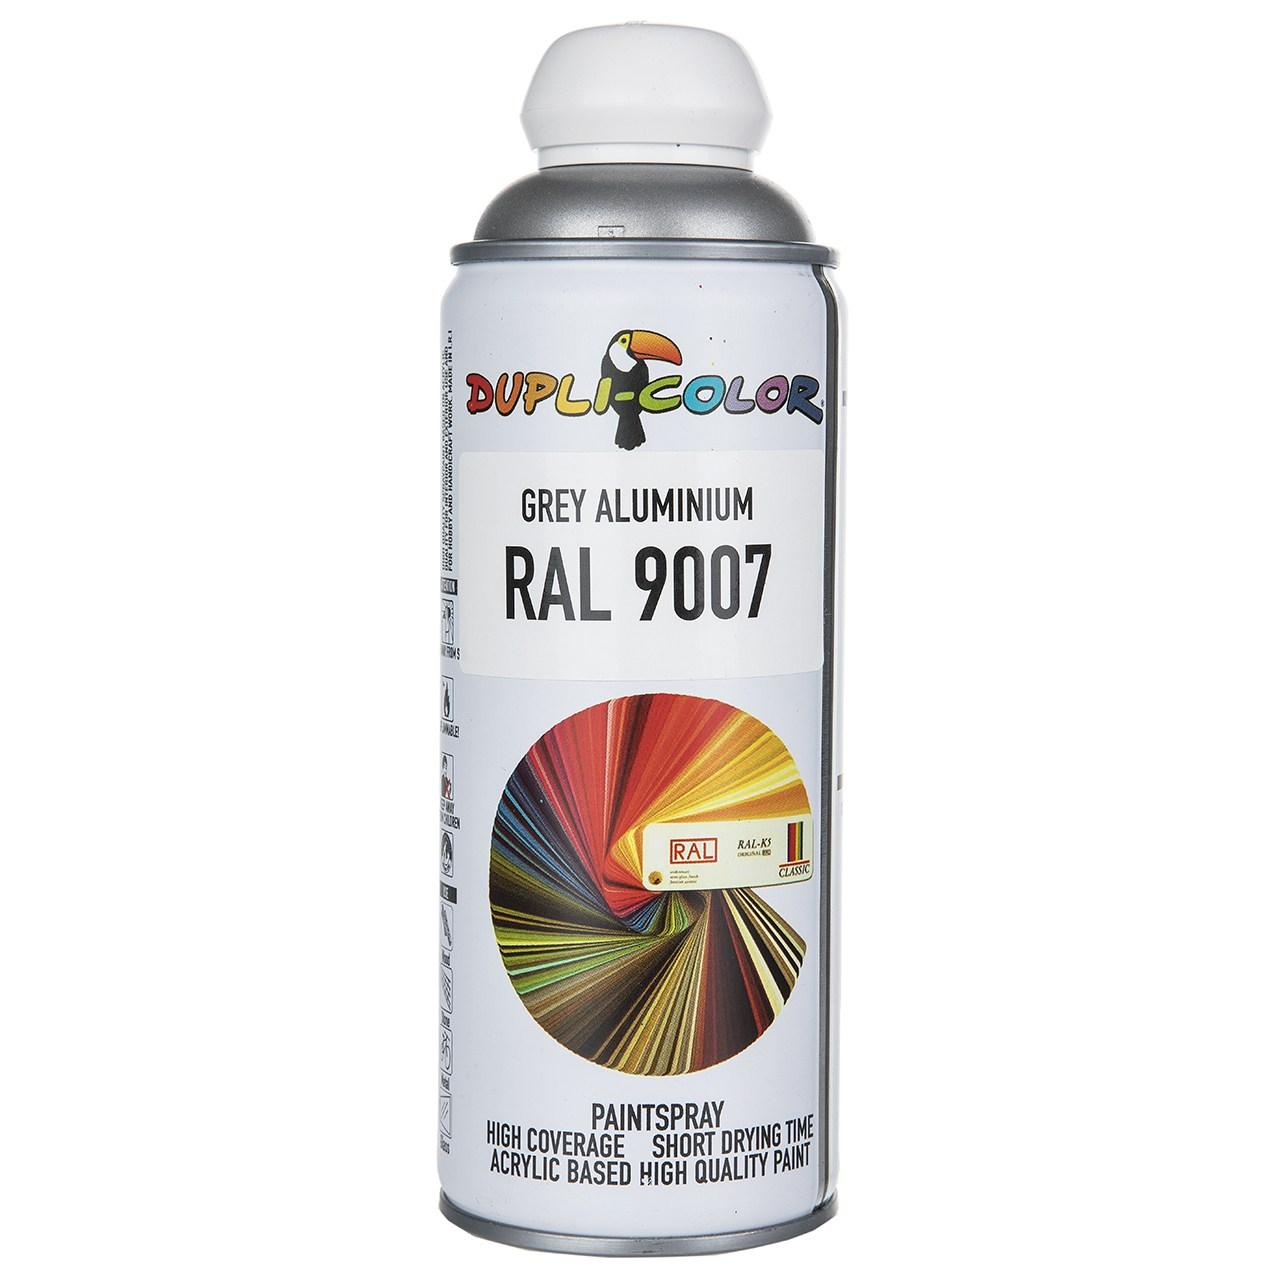 اسپری رنگ طوسی دوپلی کالر مدل RAL 9007 حجم 400 میلی لیتر